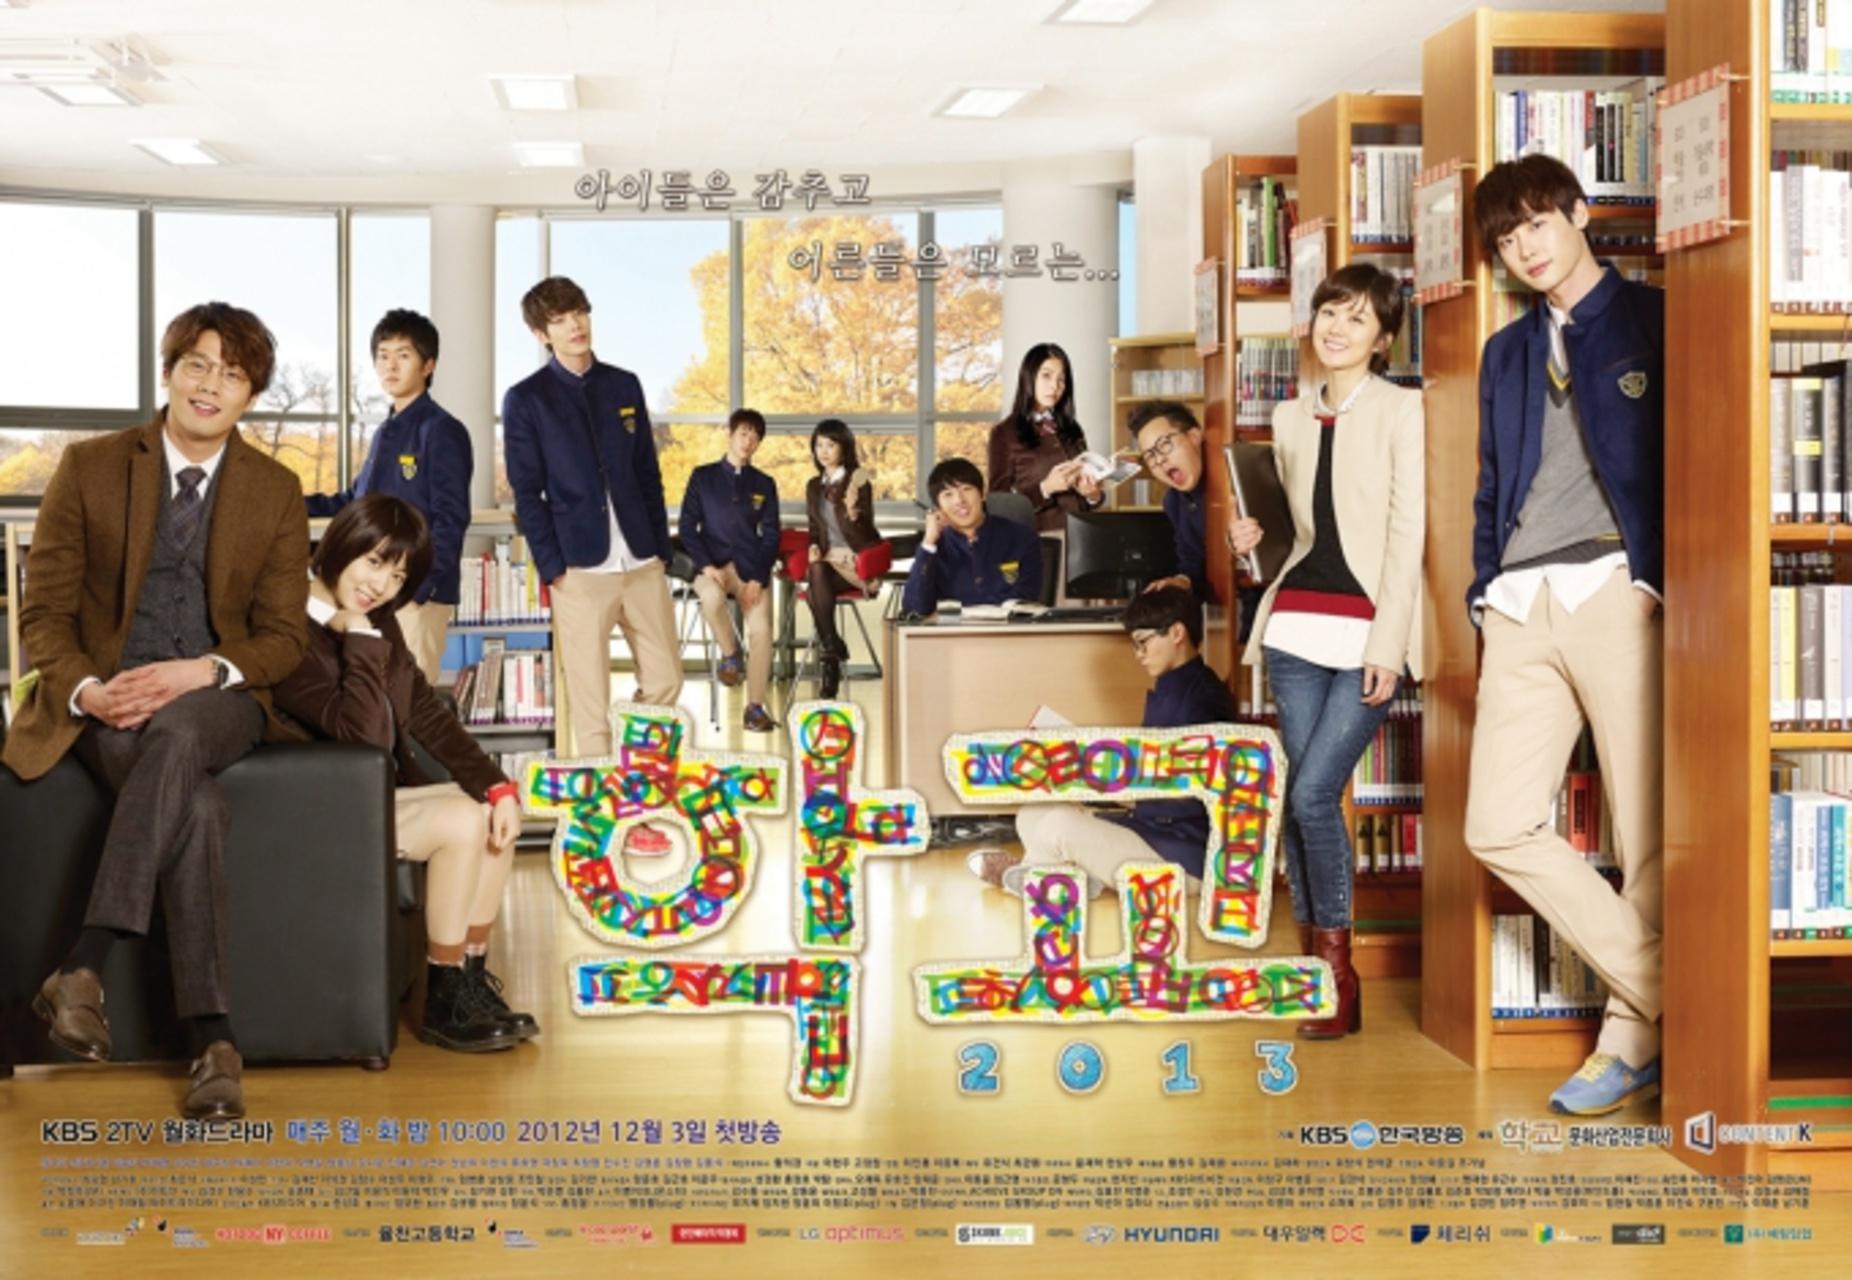 5 Drama Korea Bertemakan Sekolah Yang Wajib Kamu Tonton 5